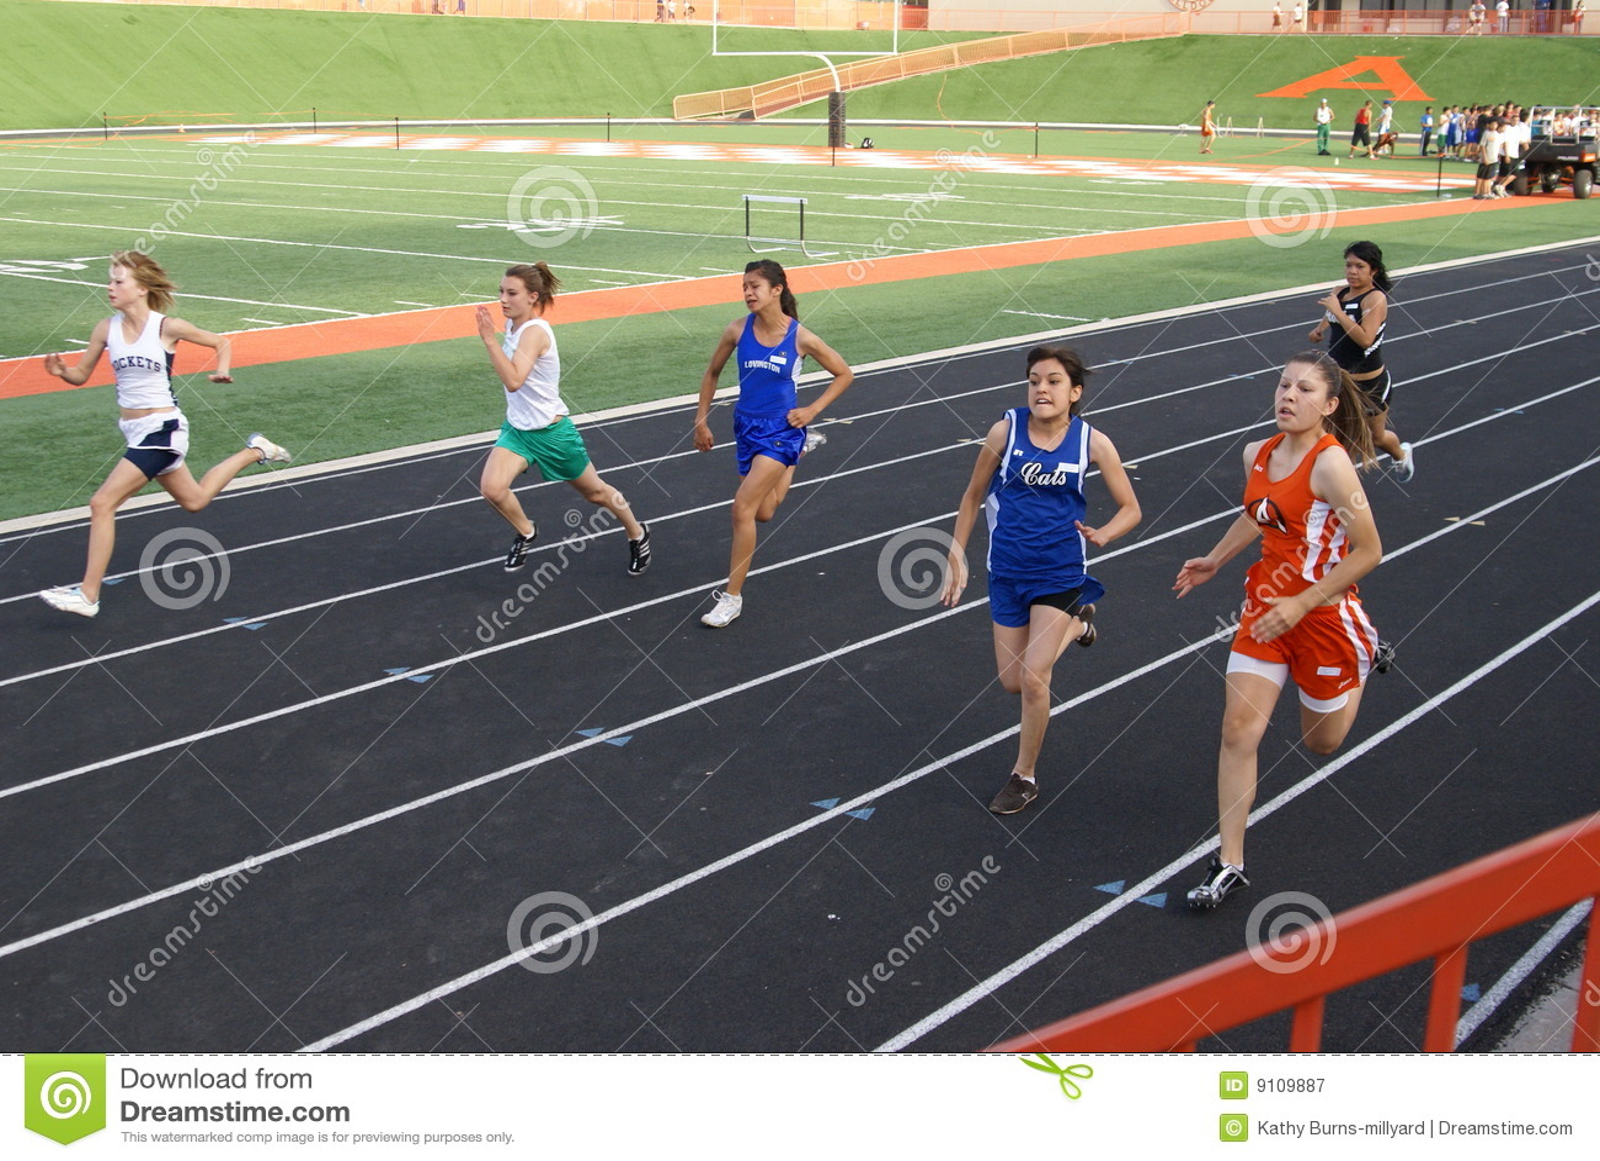 girls 100 meter race editorial photography image 9109887. Black Bedroom Furniture Sets. Home Design Ideas